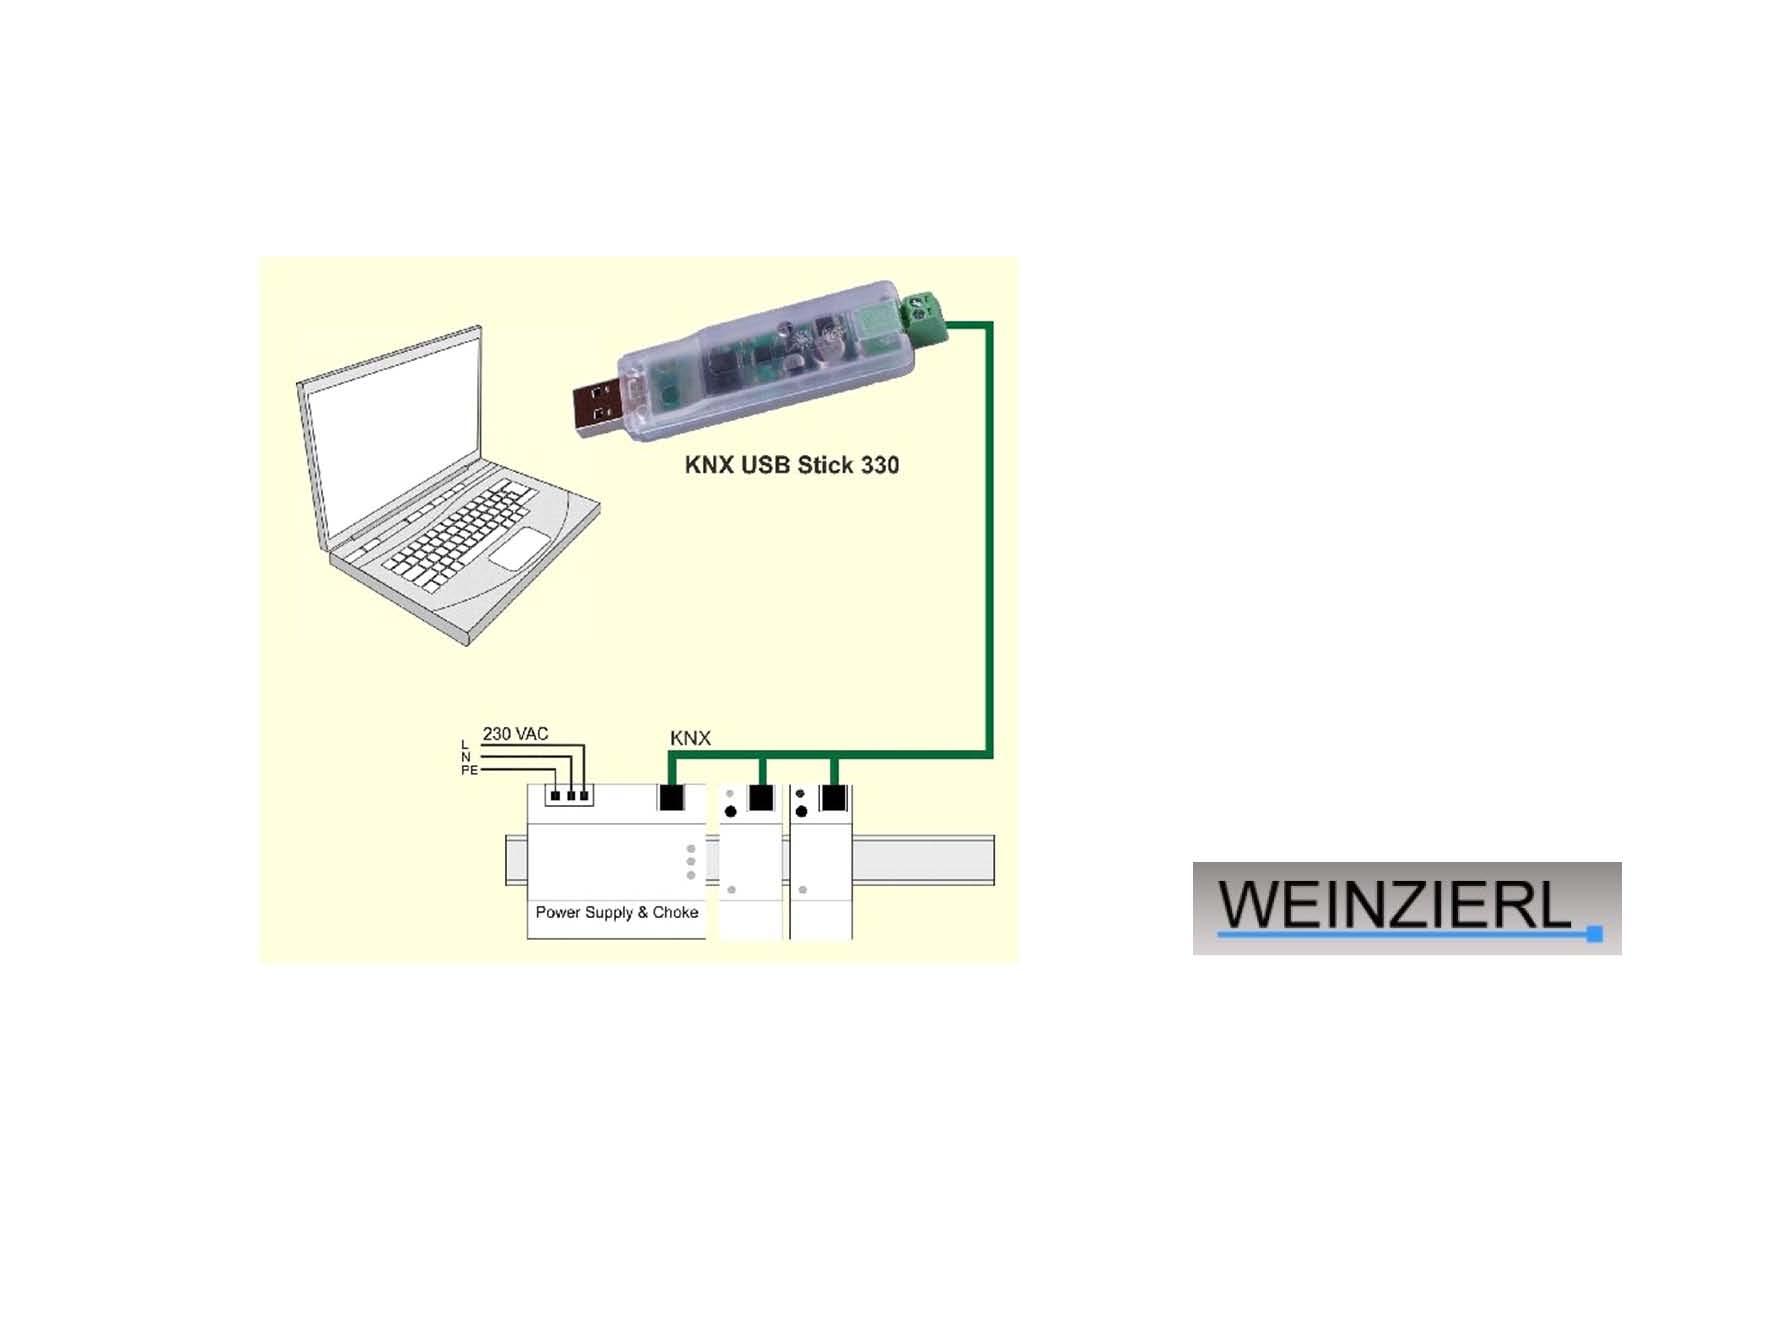 KNX USB-gränssnitt 330 från Weinzierl